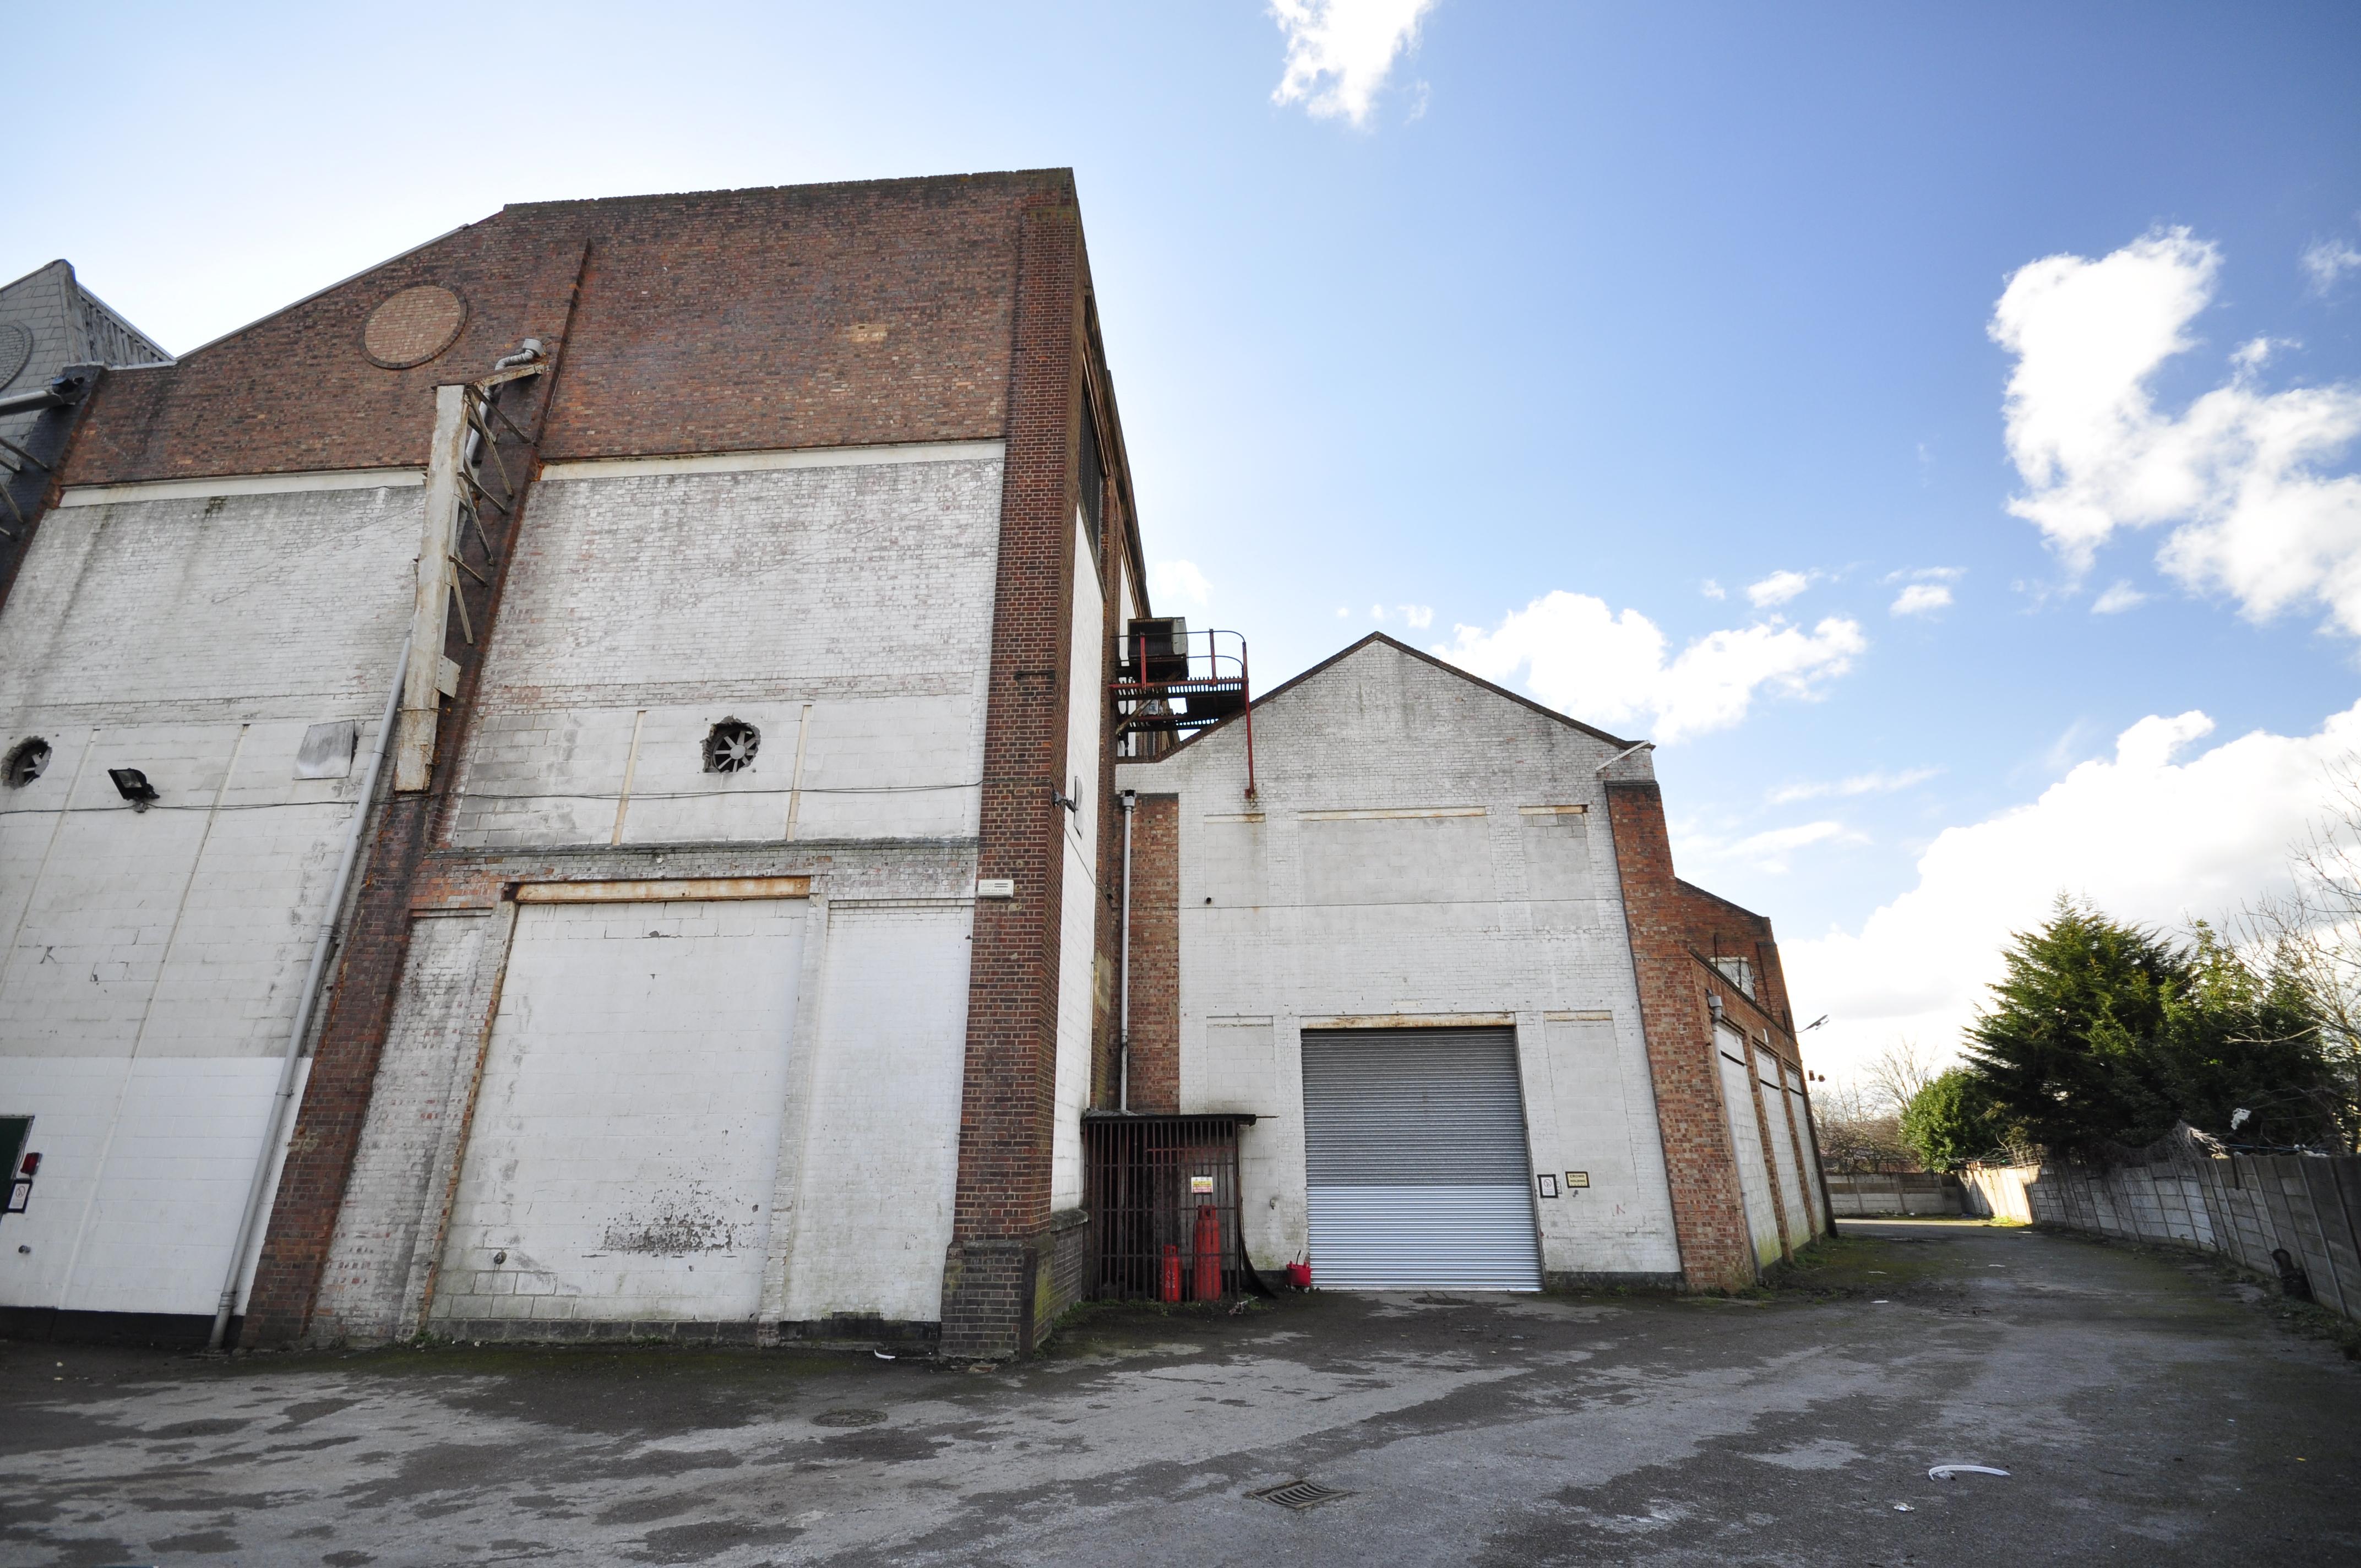 Neasden Warehouse, NW10 2XA - Exterior Loading Area - Image 4